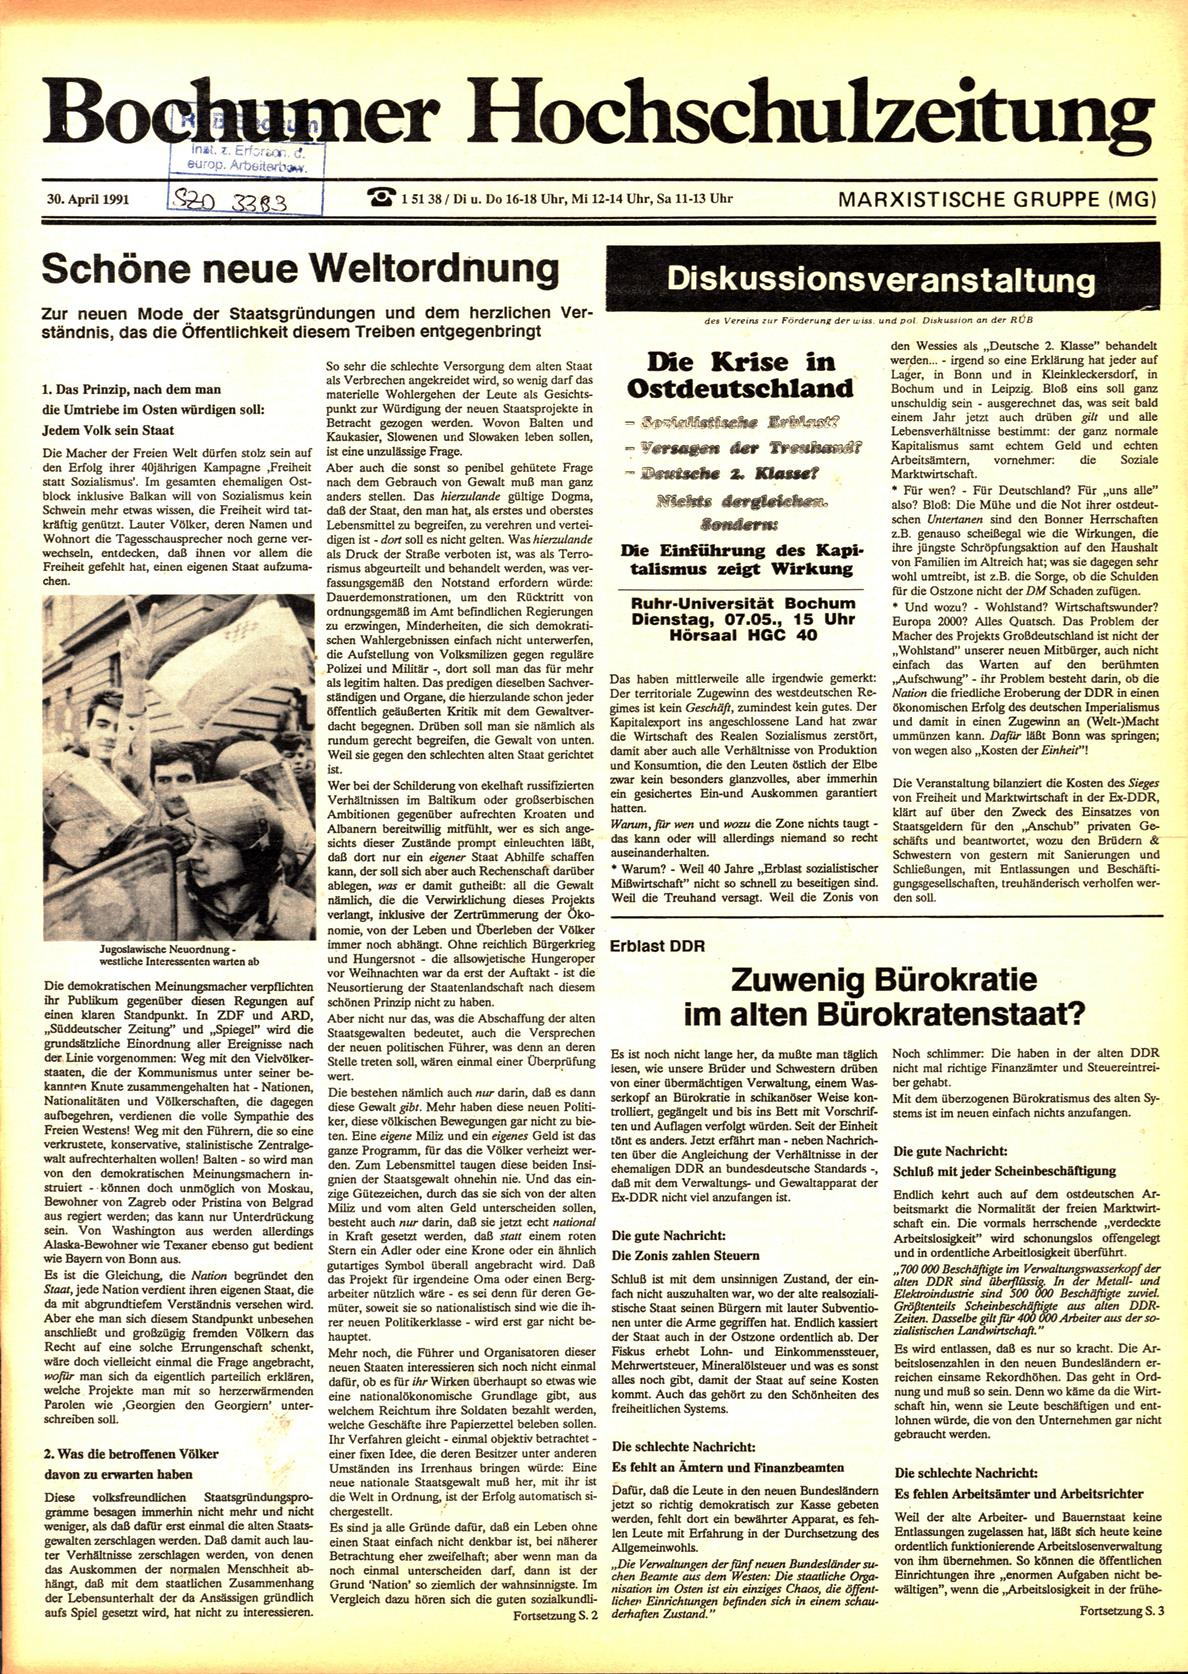 Bochum_BHZ_19910430_001